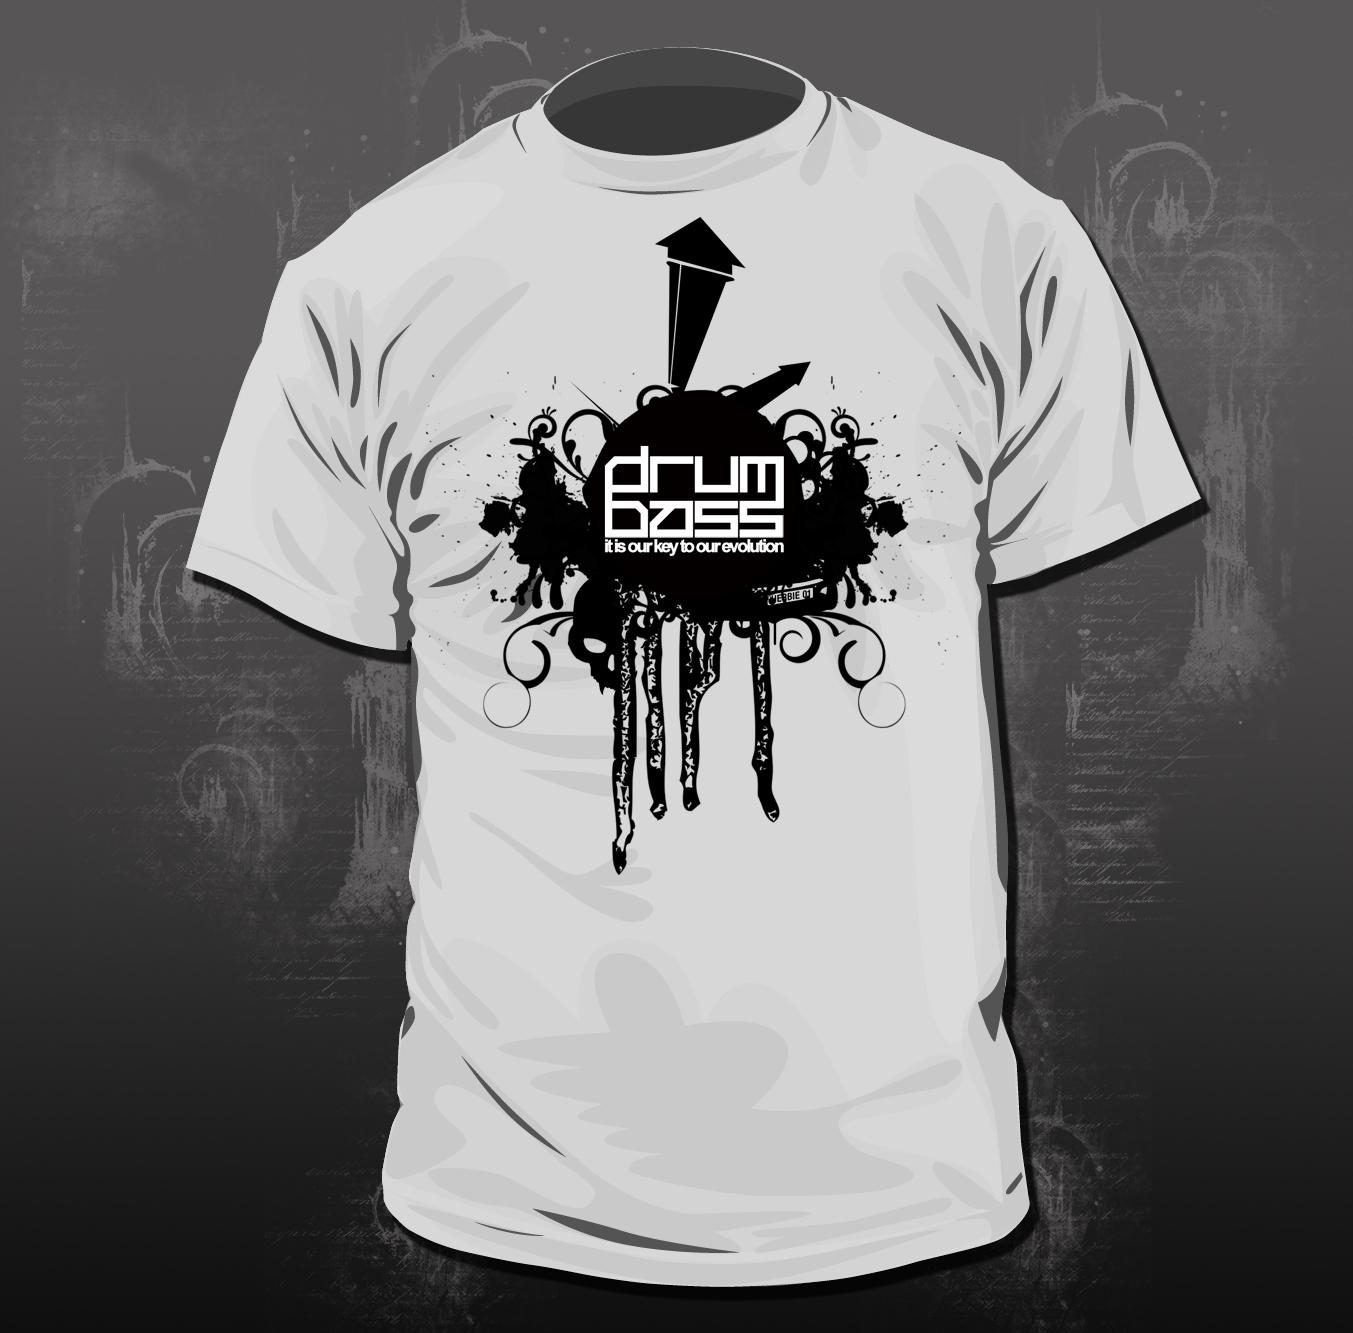 Print A Design On A Shirt | Cool T Shirt Print Design